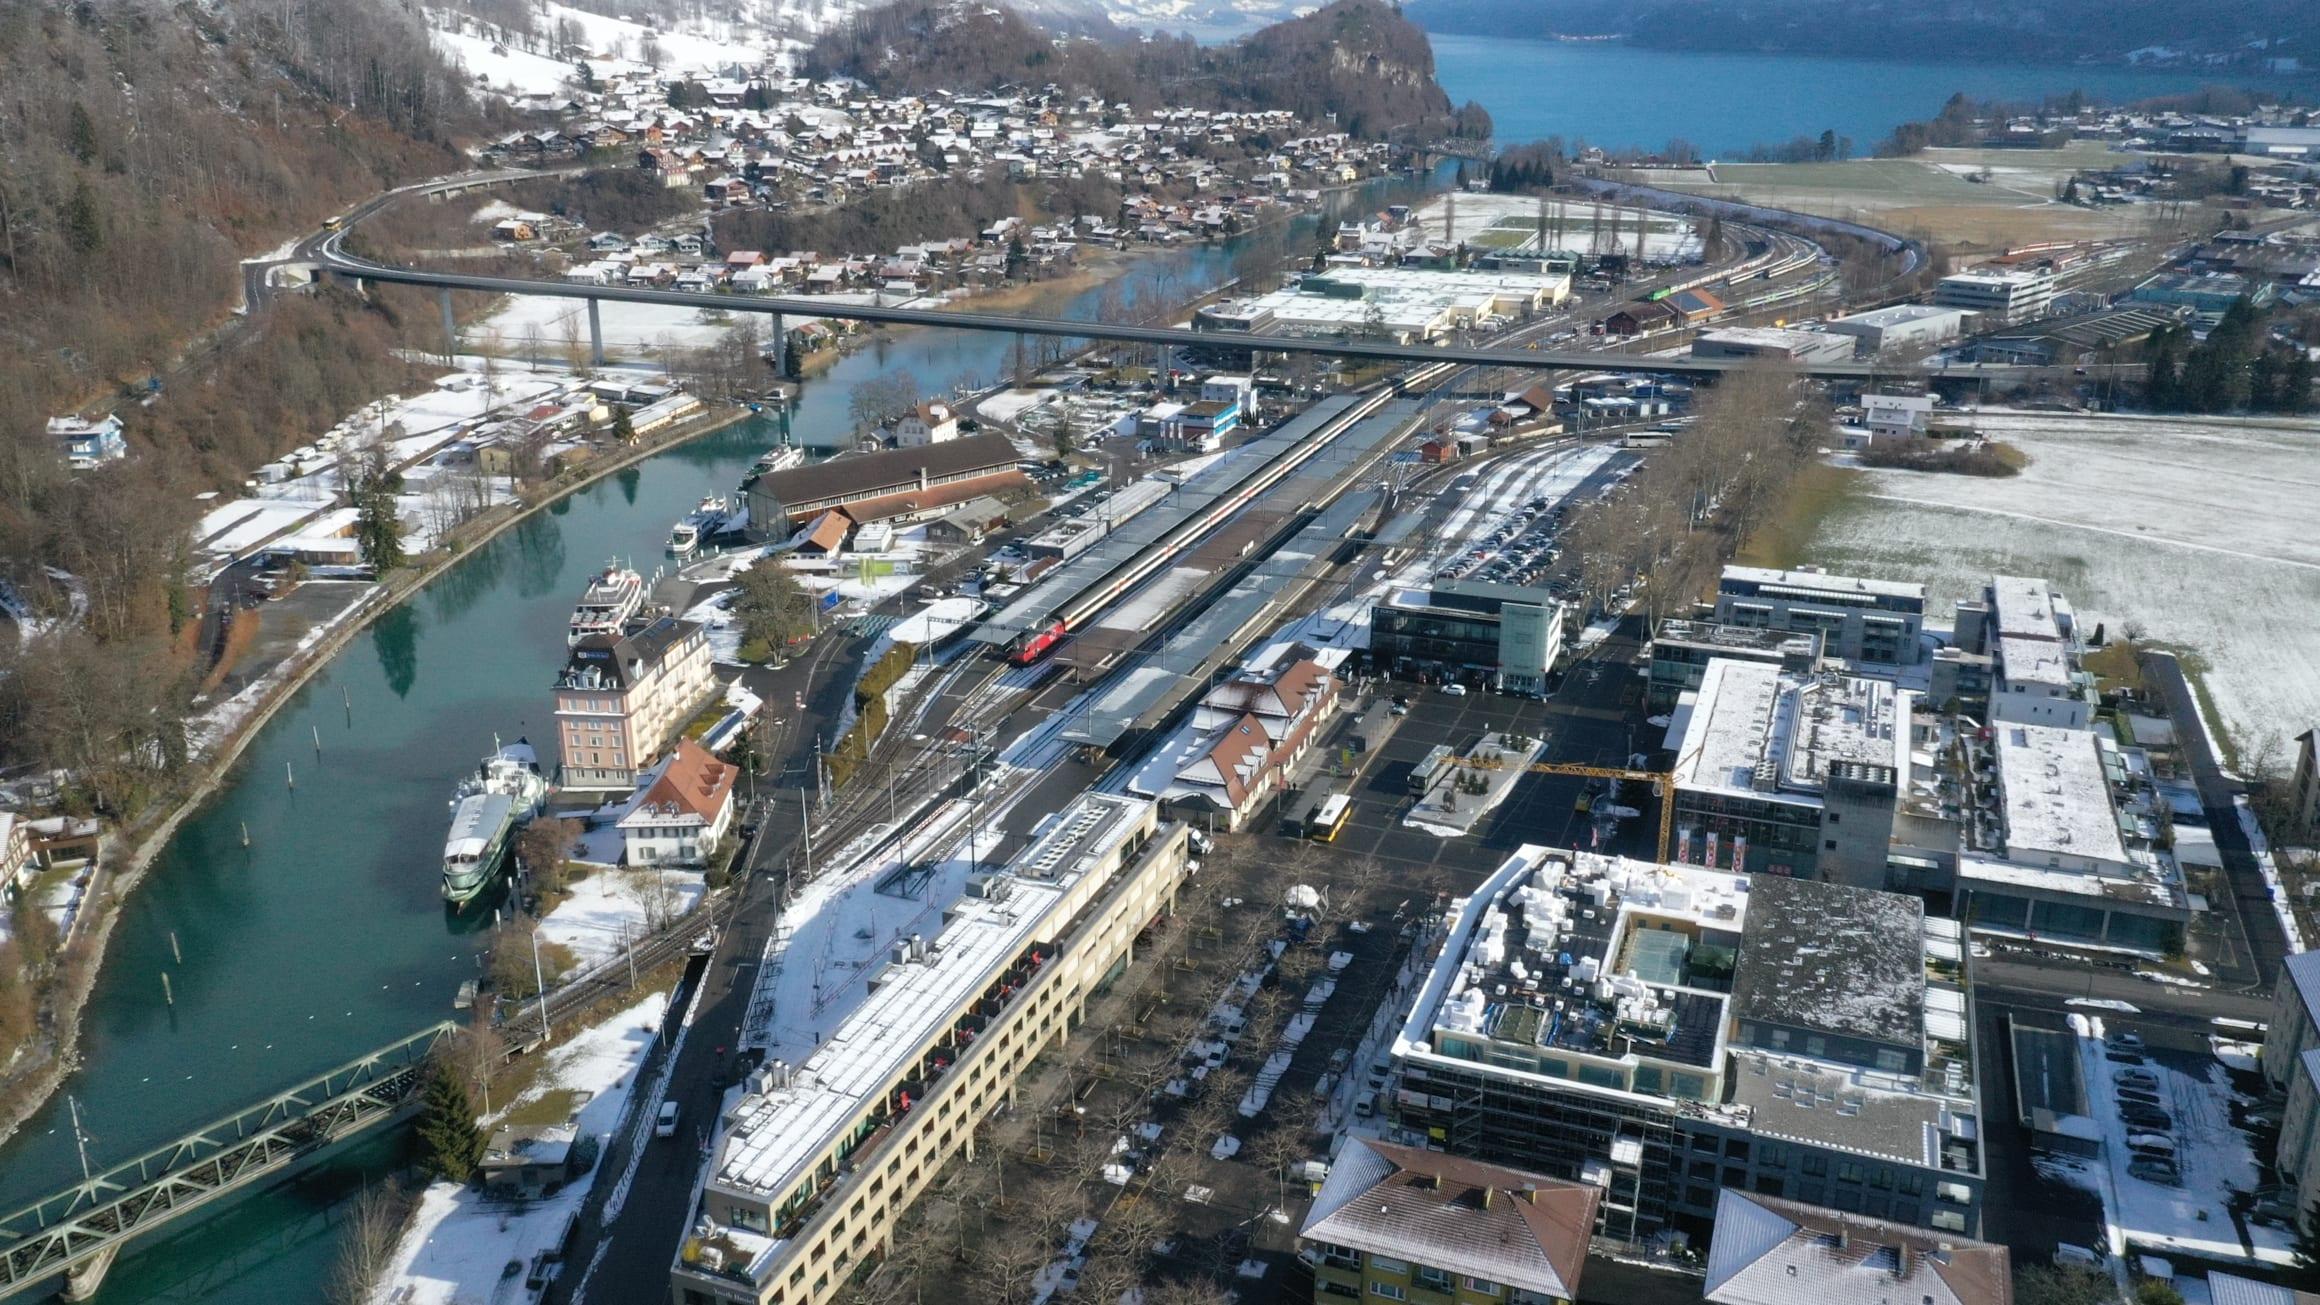 Drohnenaufnahme Areal Interlaken Ost